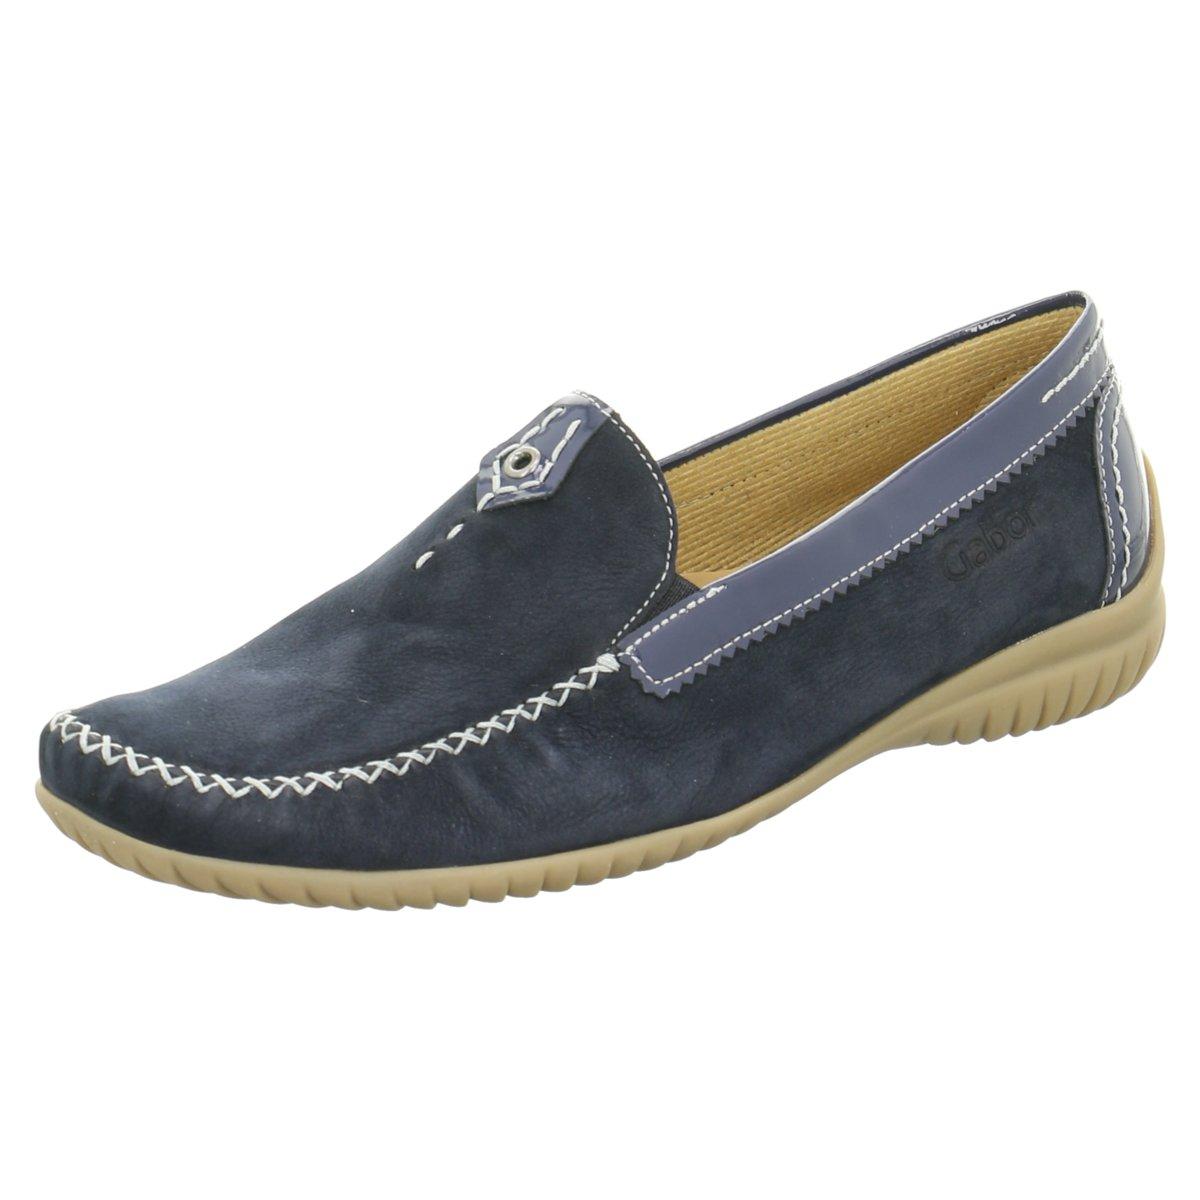 Gabor comfort Damen Slipper NV 86.090.26 blau 89149